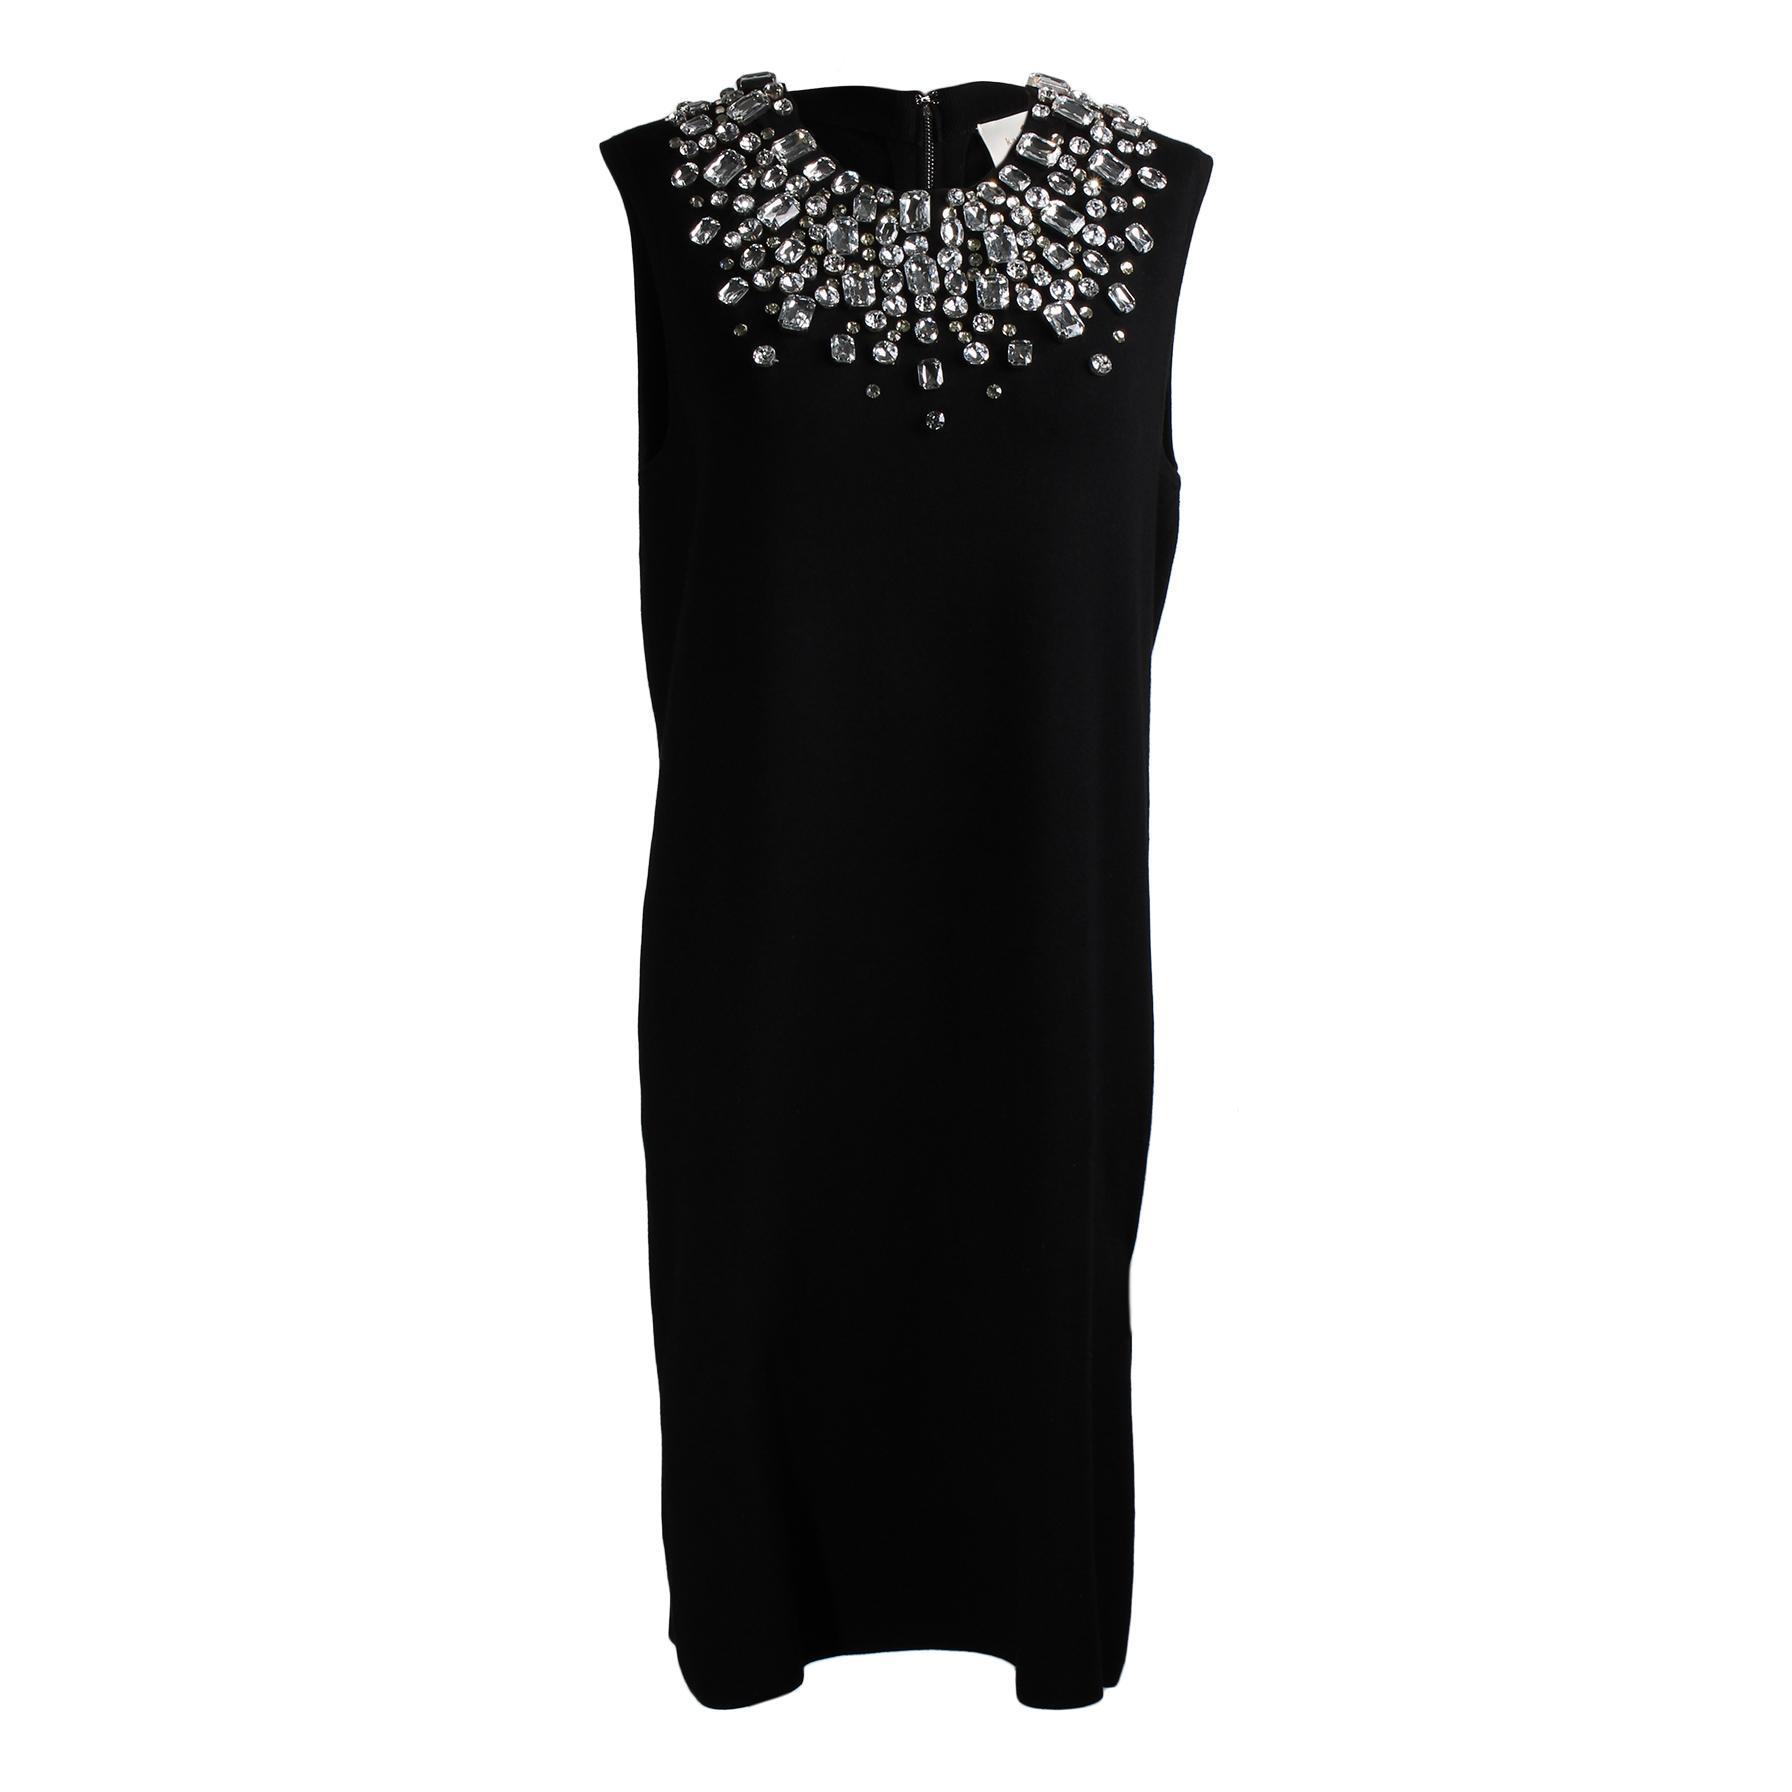 Kate Spade Size Large Black Jeweled Collar Dress